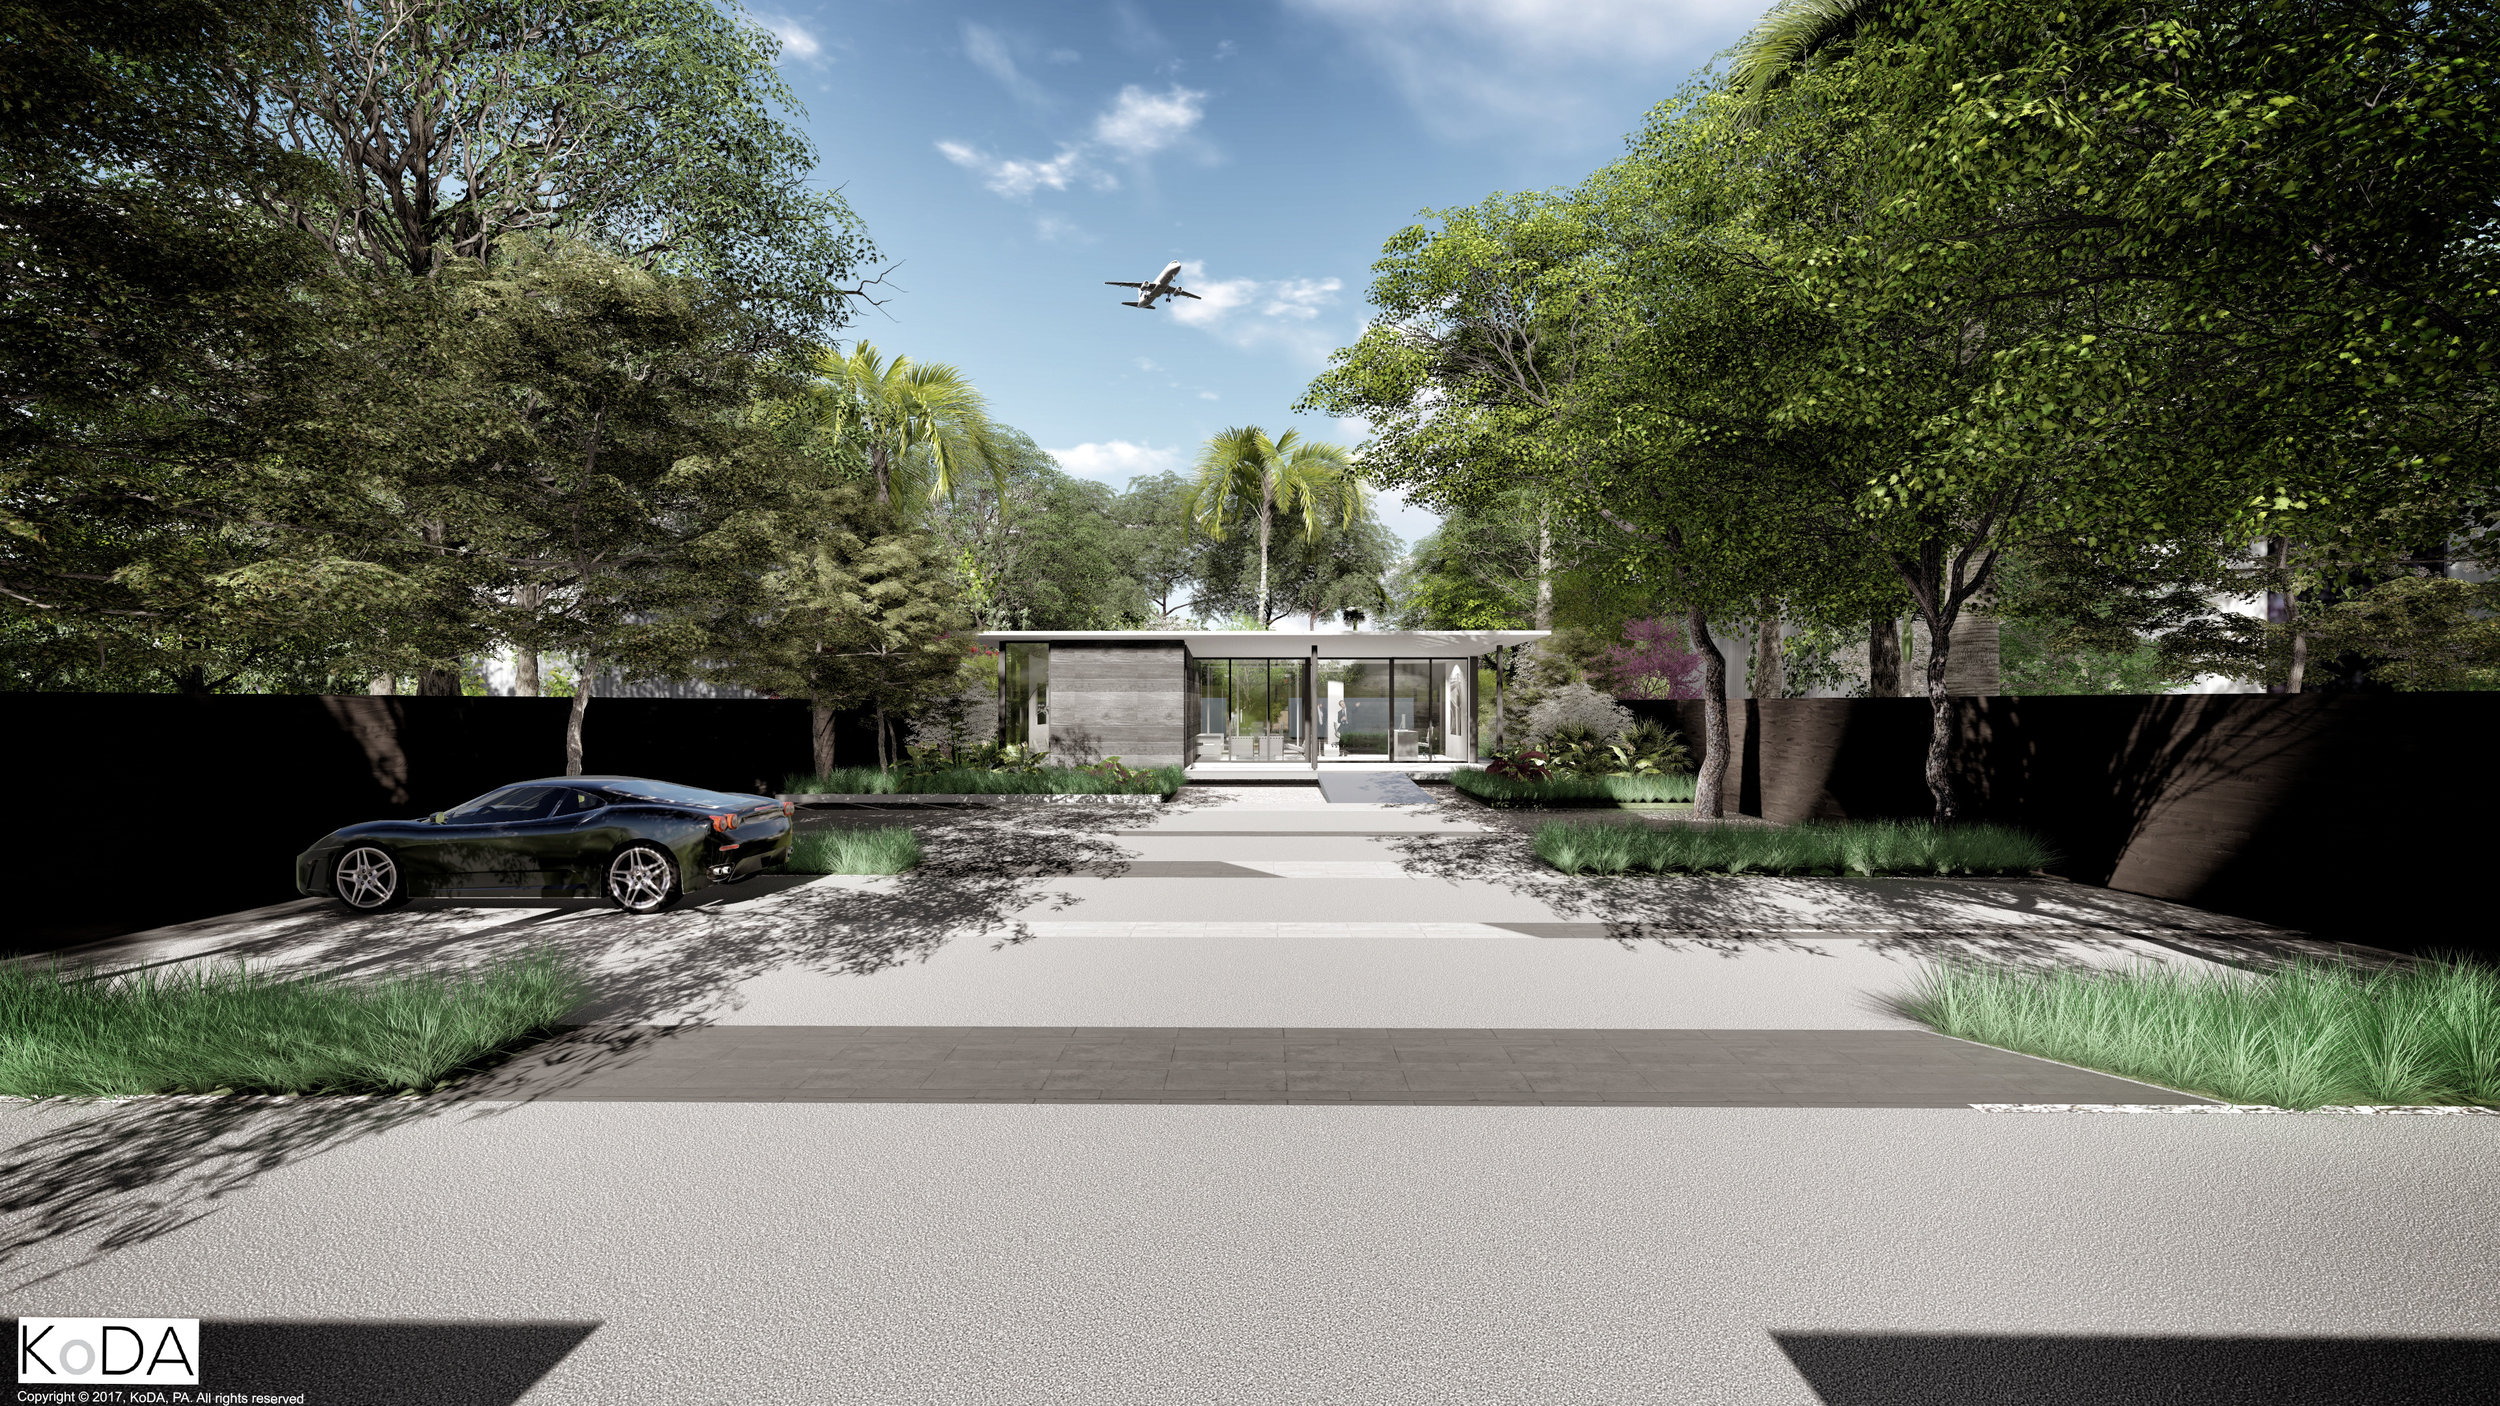 Take A Look Inside Aviation Resource Group's New KoDA-Designed Headquarters in Dania Beach, Florida